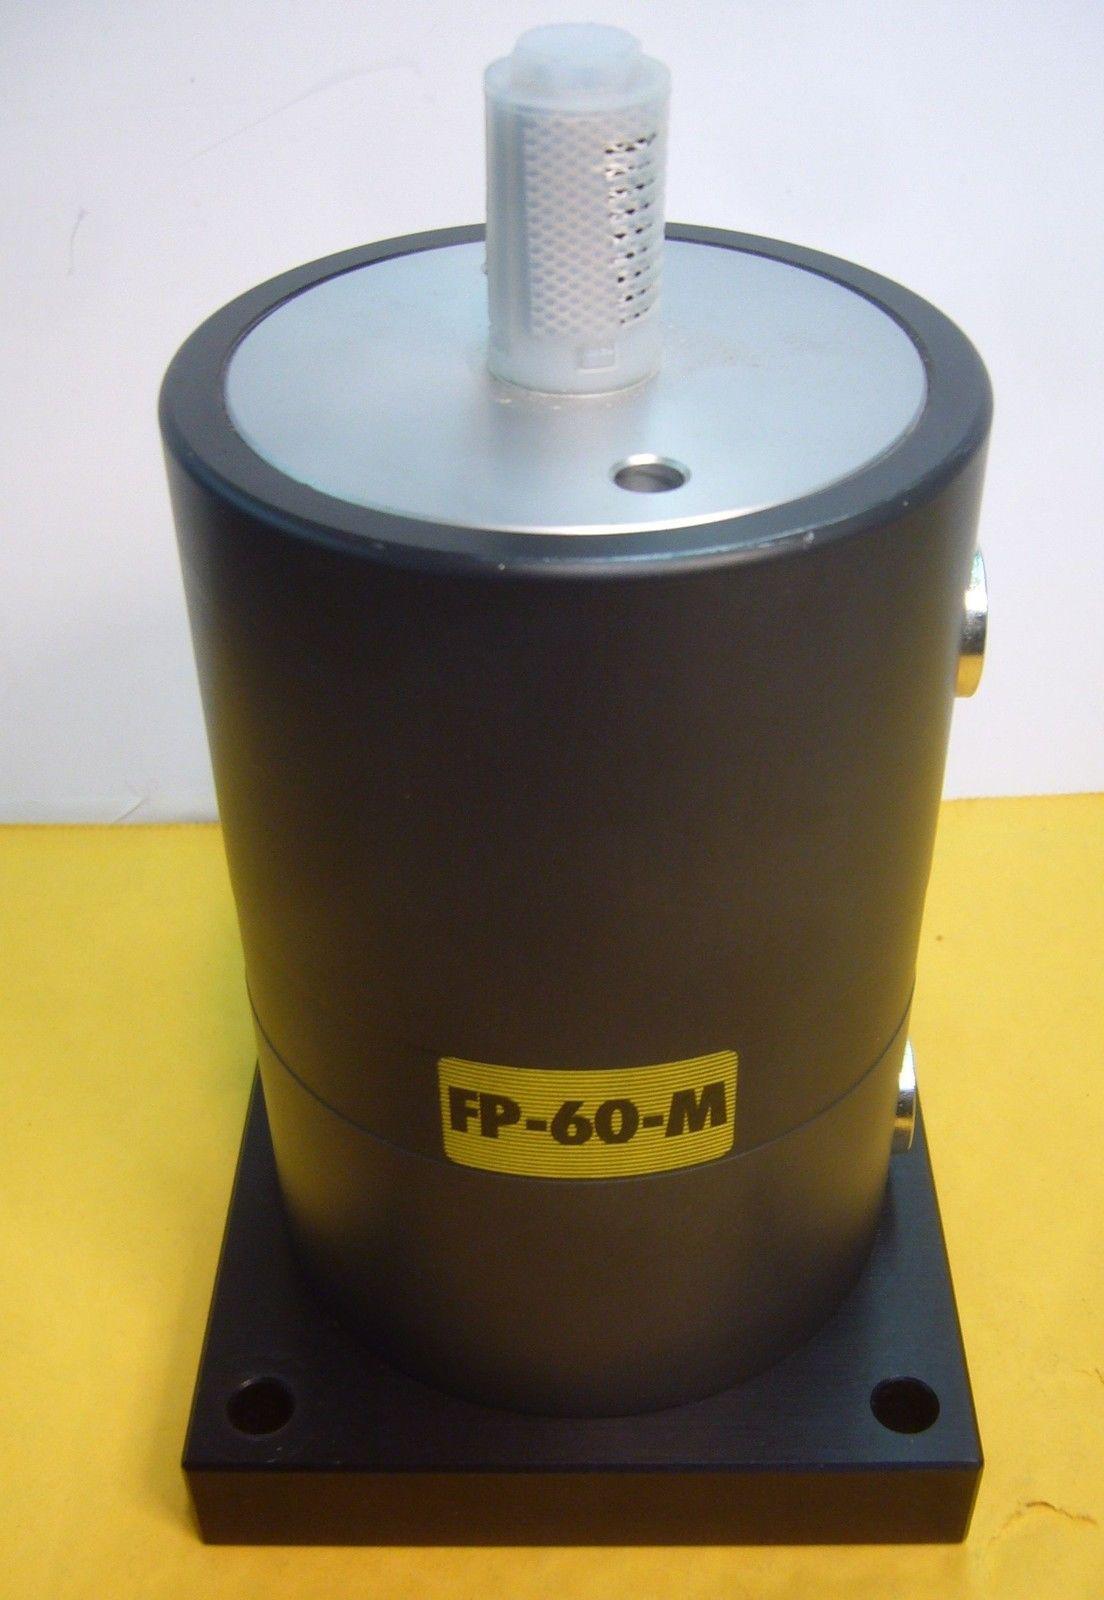 FP-60-M参数与尺寸介绍点击进入